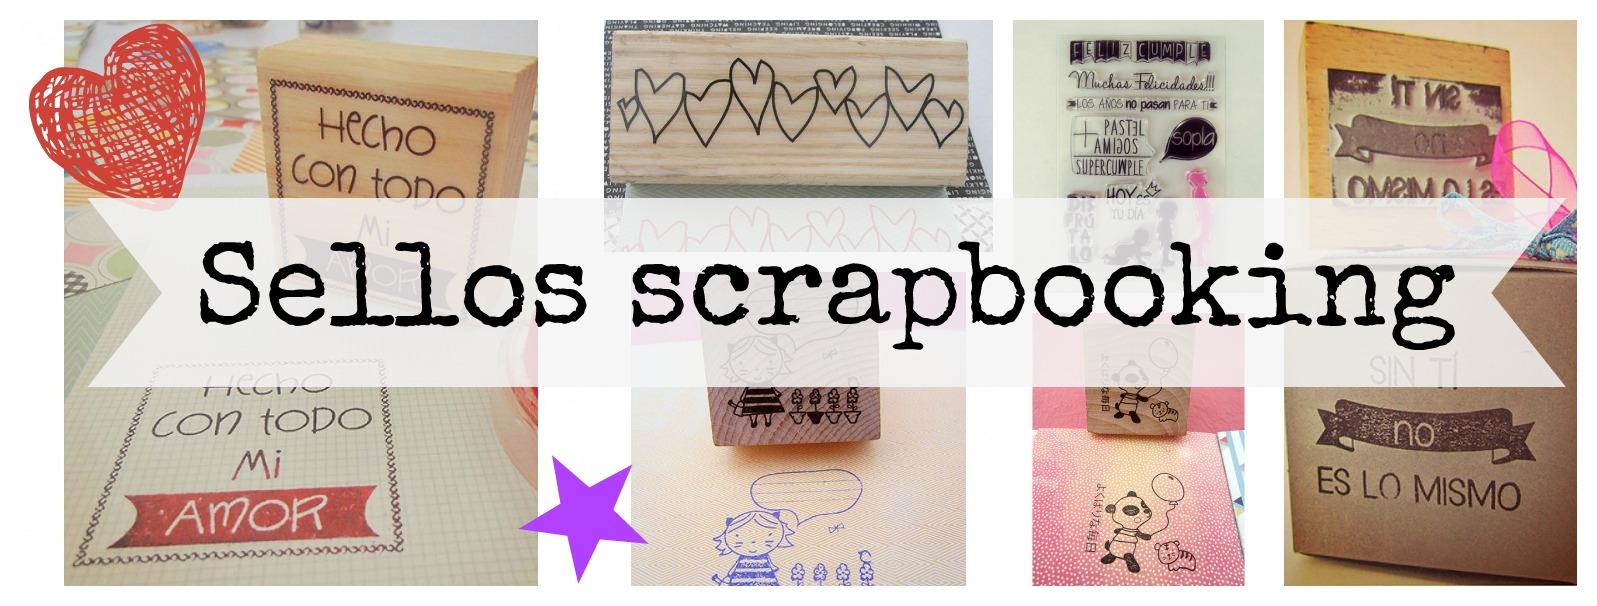 sellos scrapbooking